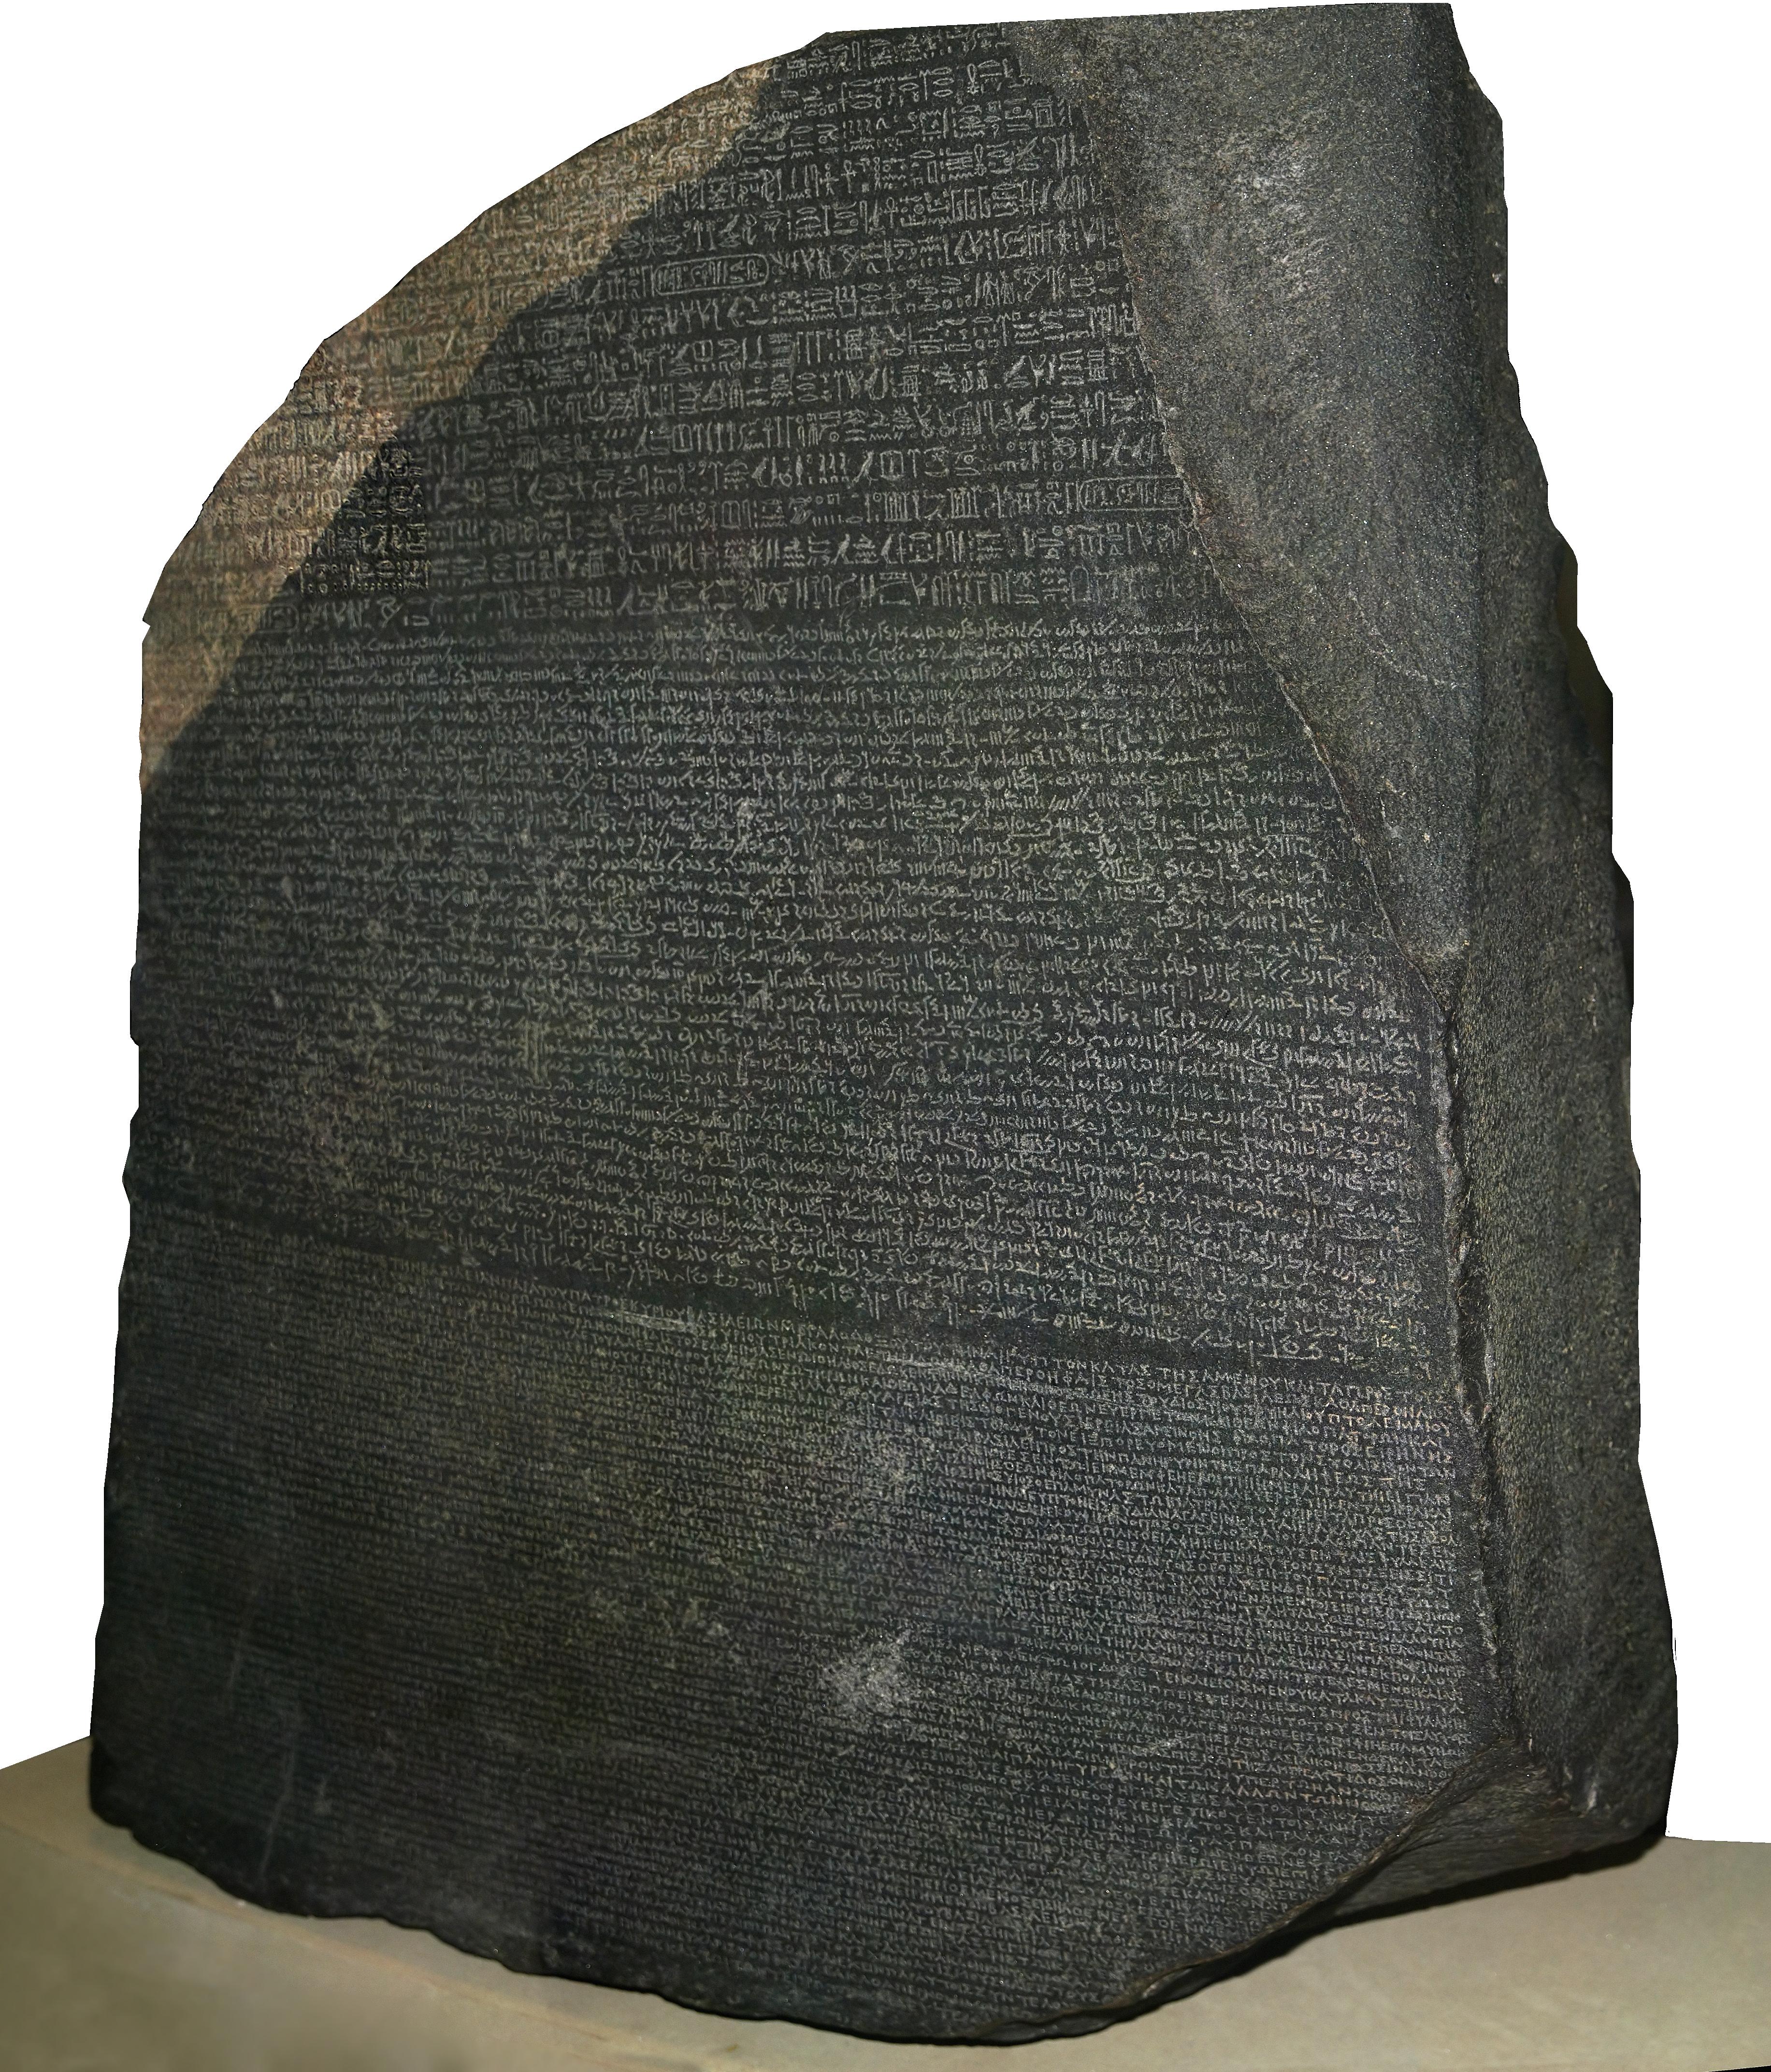 Rosetta_Stone1.png